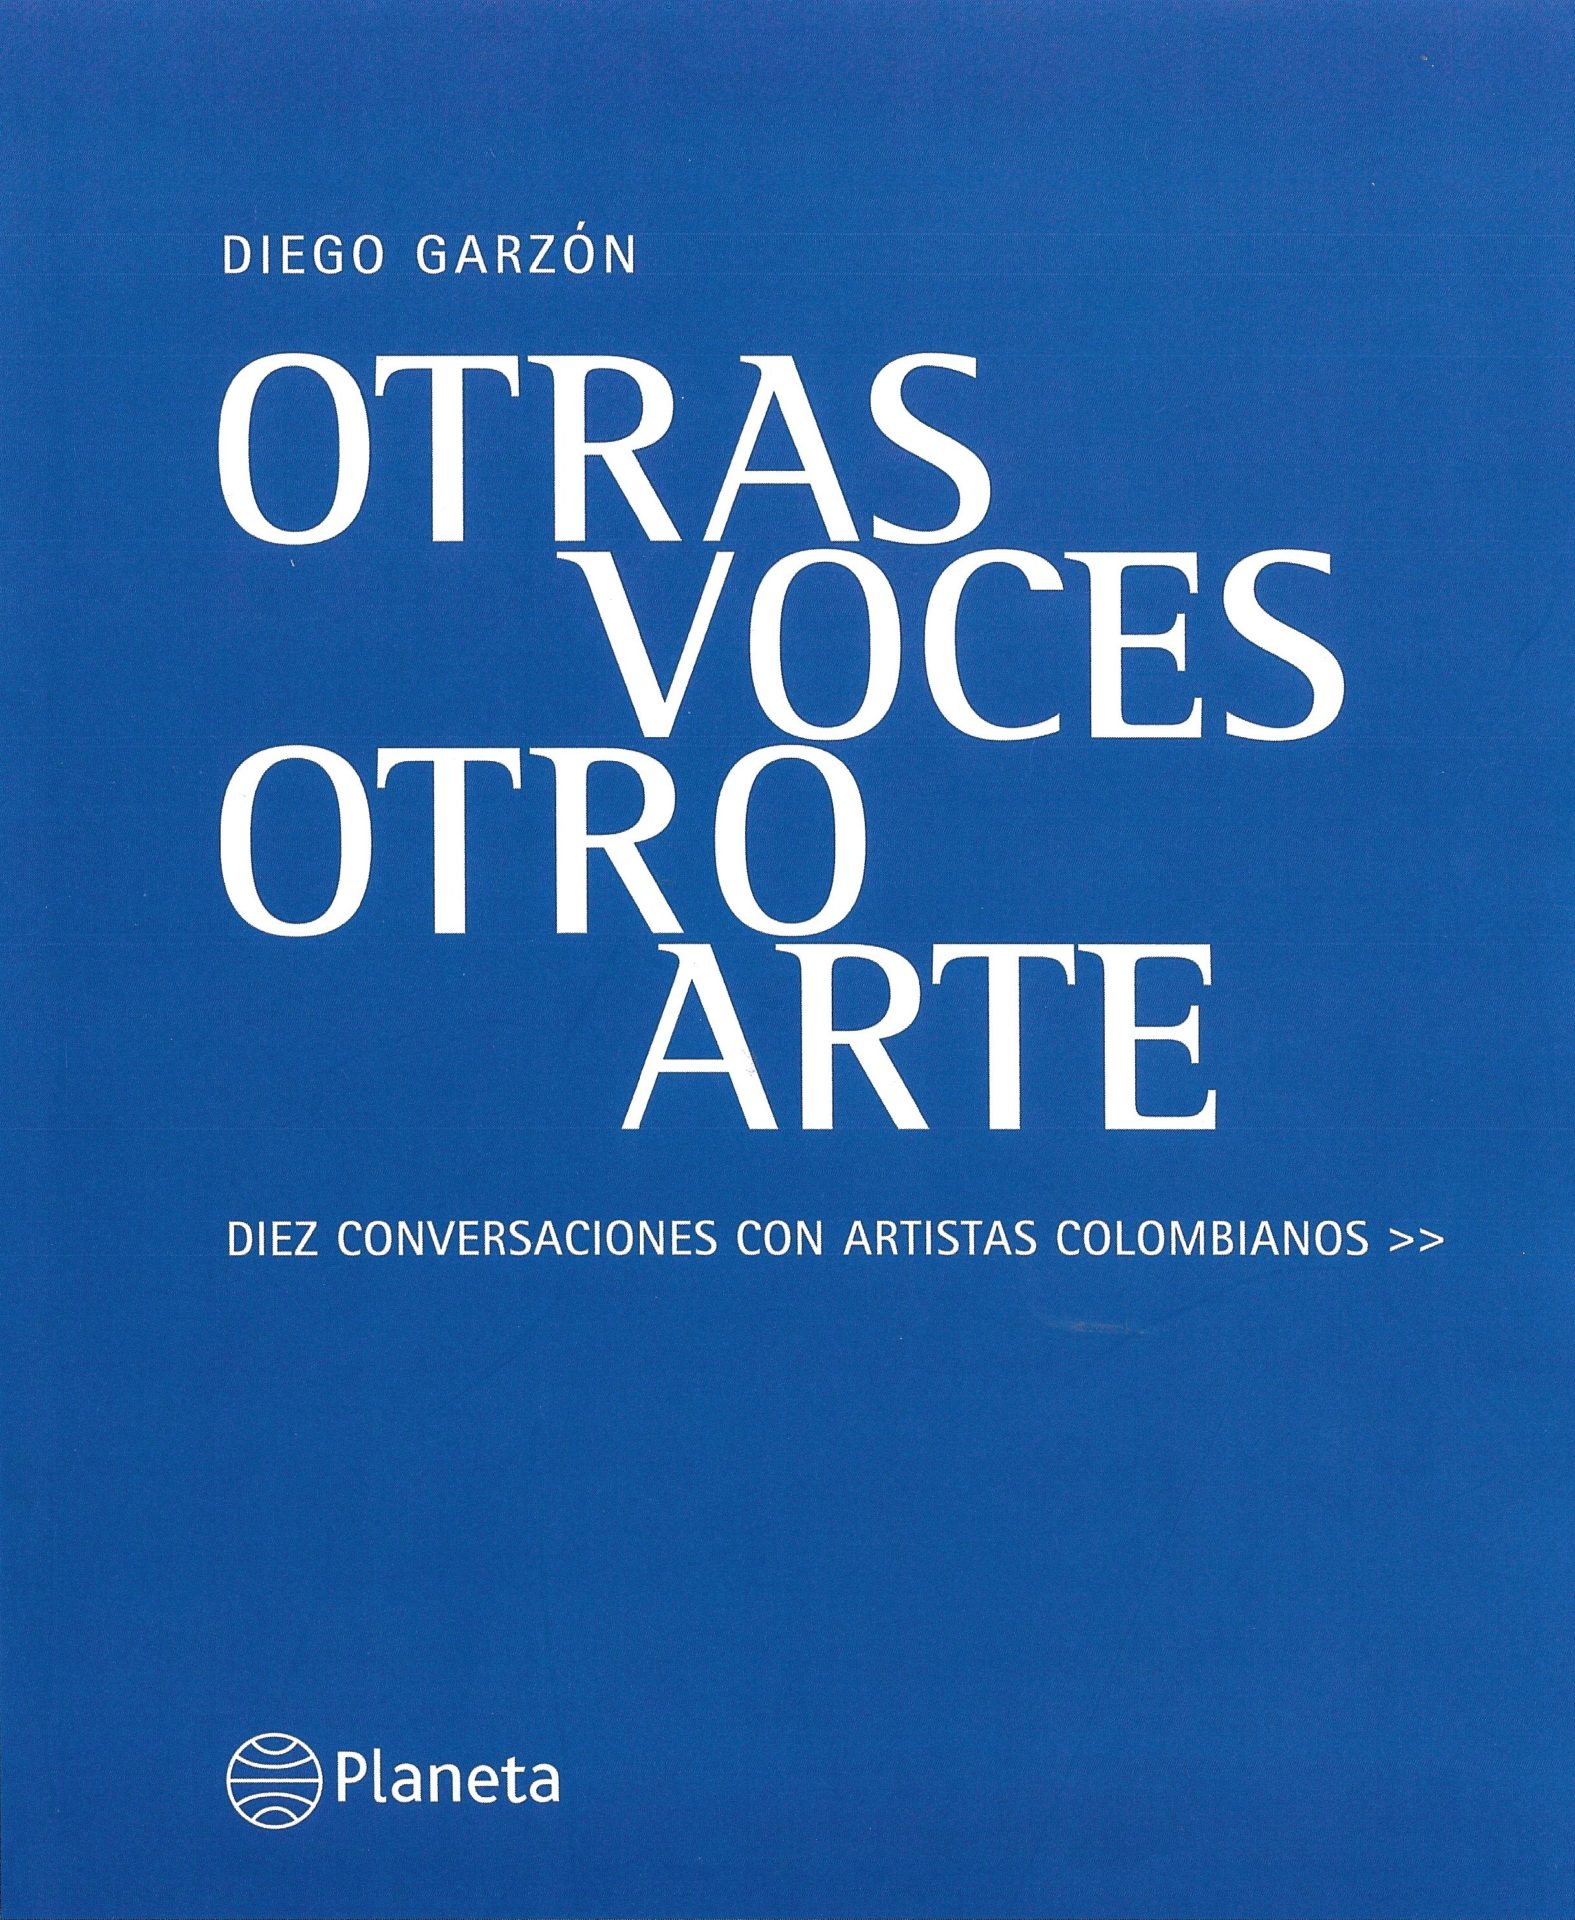 "Garzón, Diego.""María Fernanda Cardoso"". In Otras Voces Otro Arte by Diego Garzón, 150-171. Bogotá: Editorial Planeta, 2005. Download PDF"